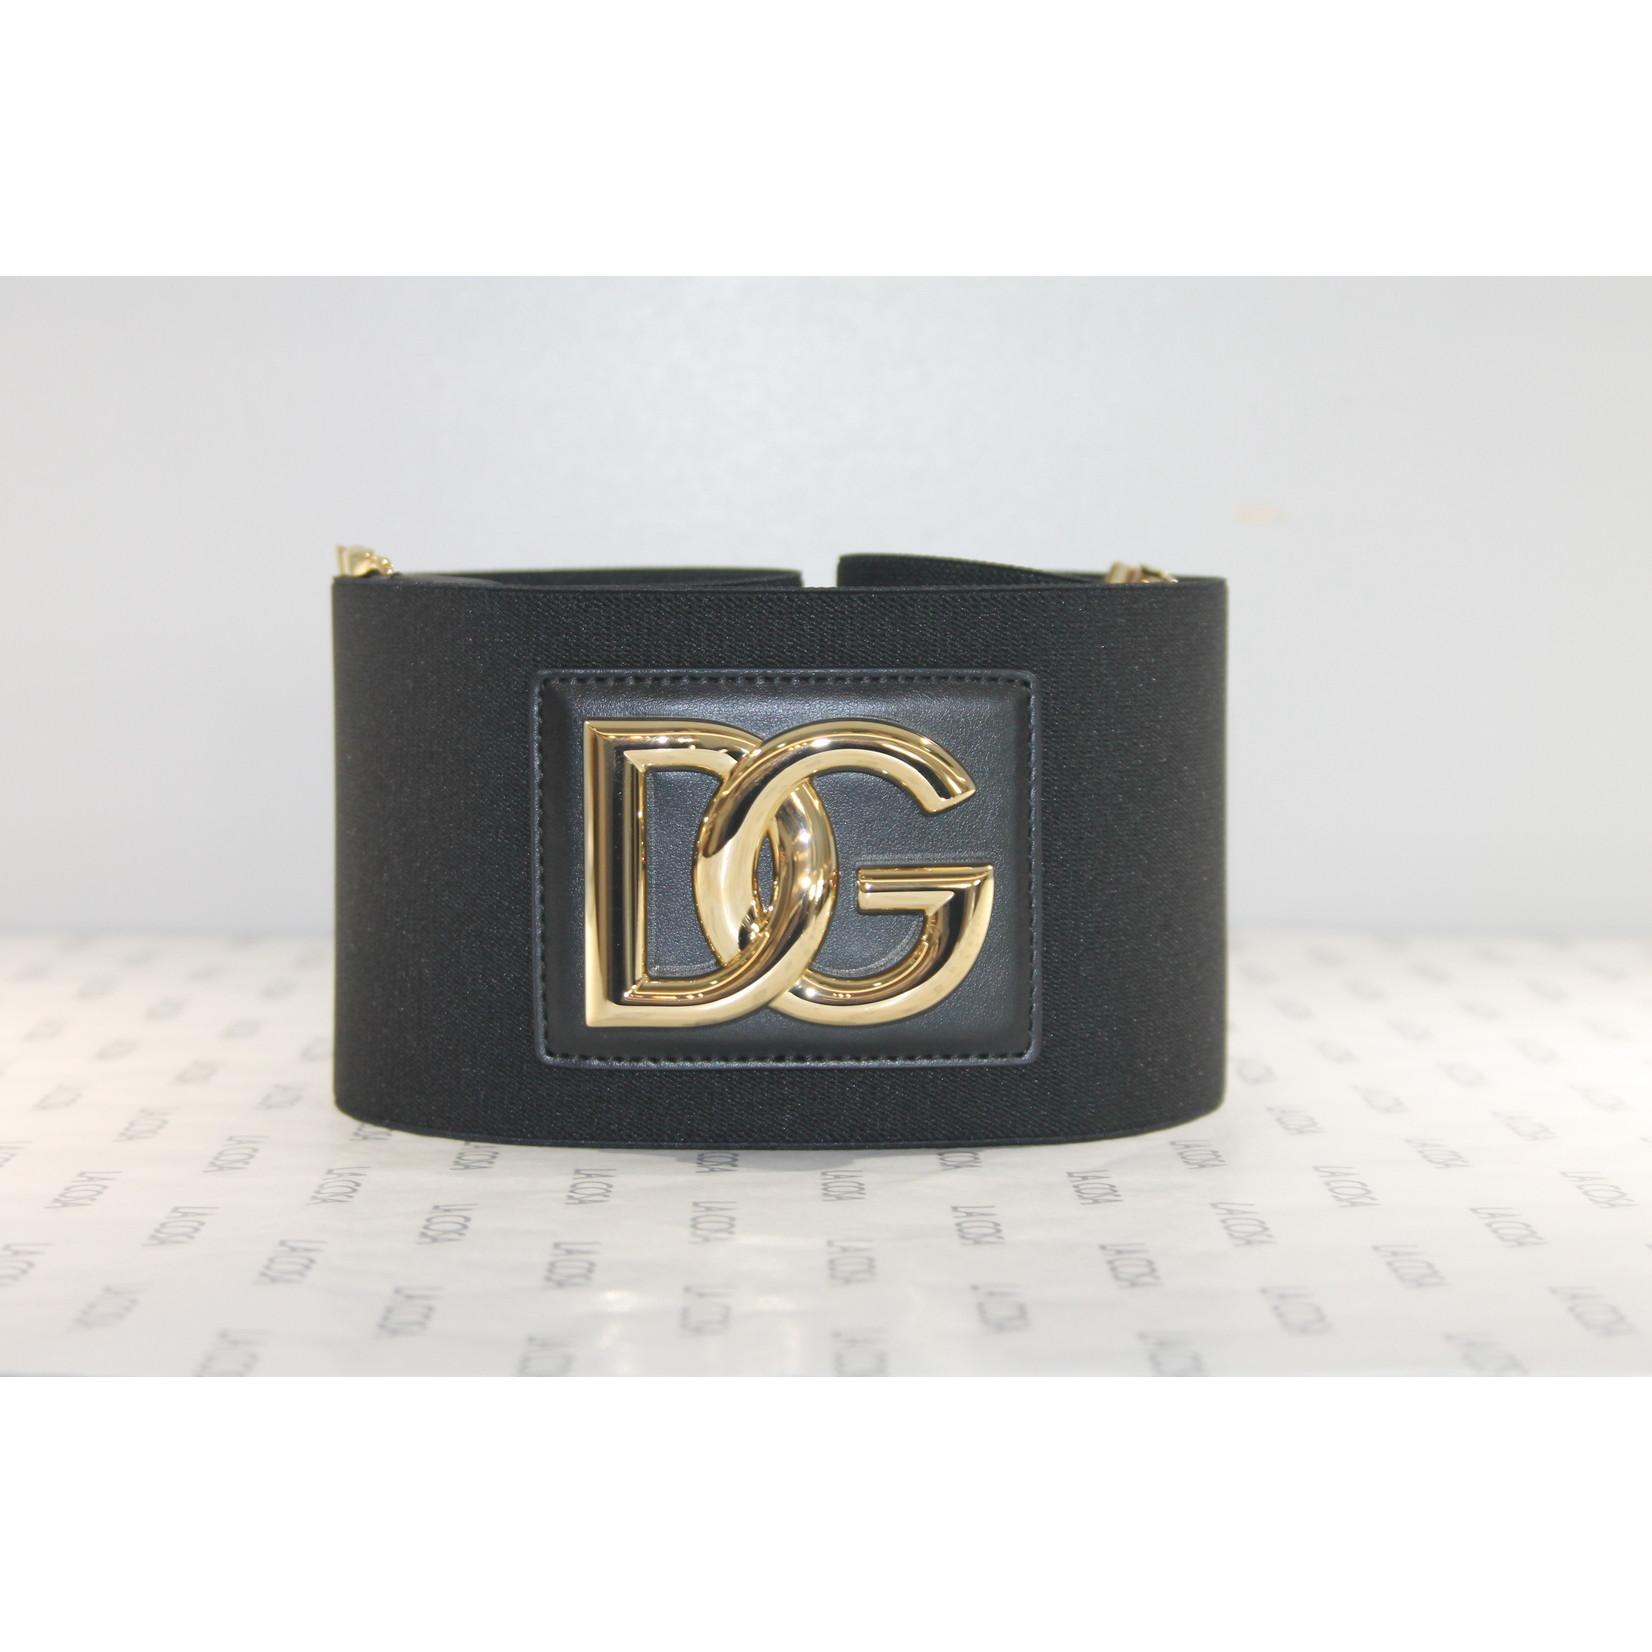 Dolce&Gabbana Riemen Riemen 42989